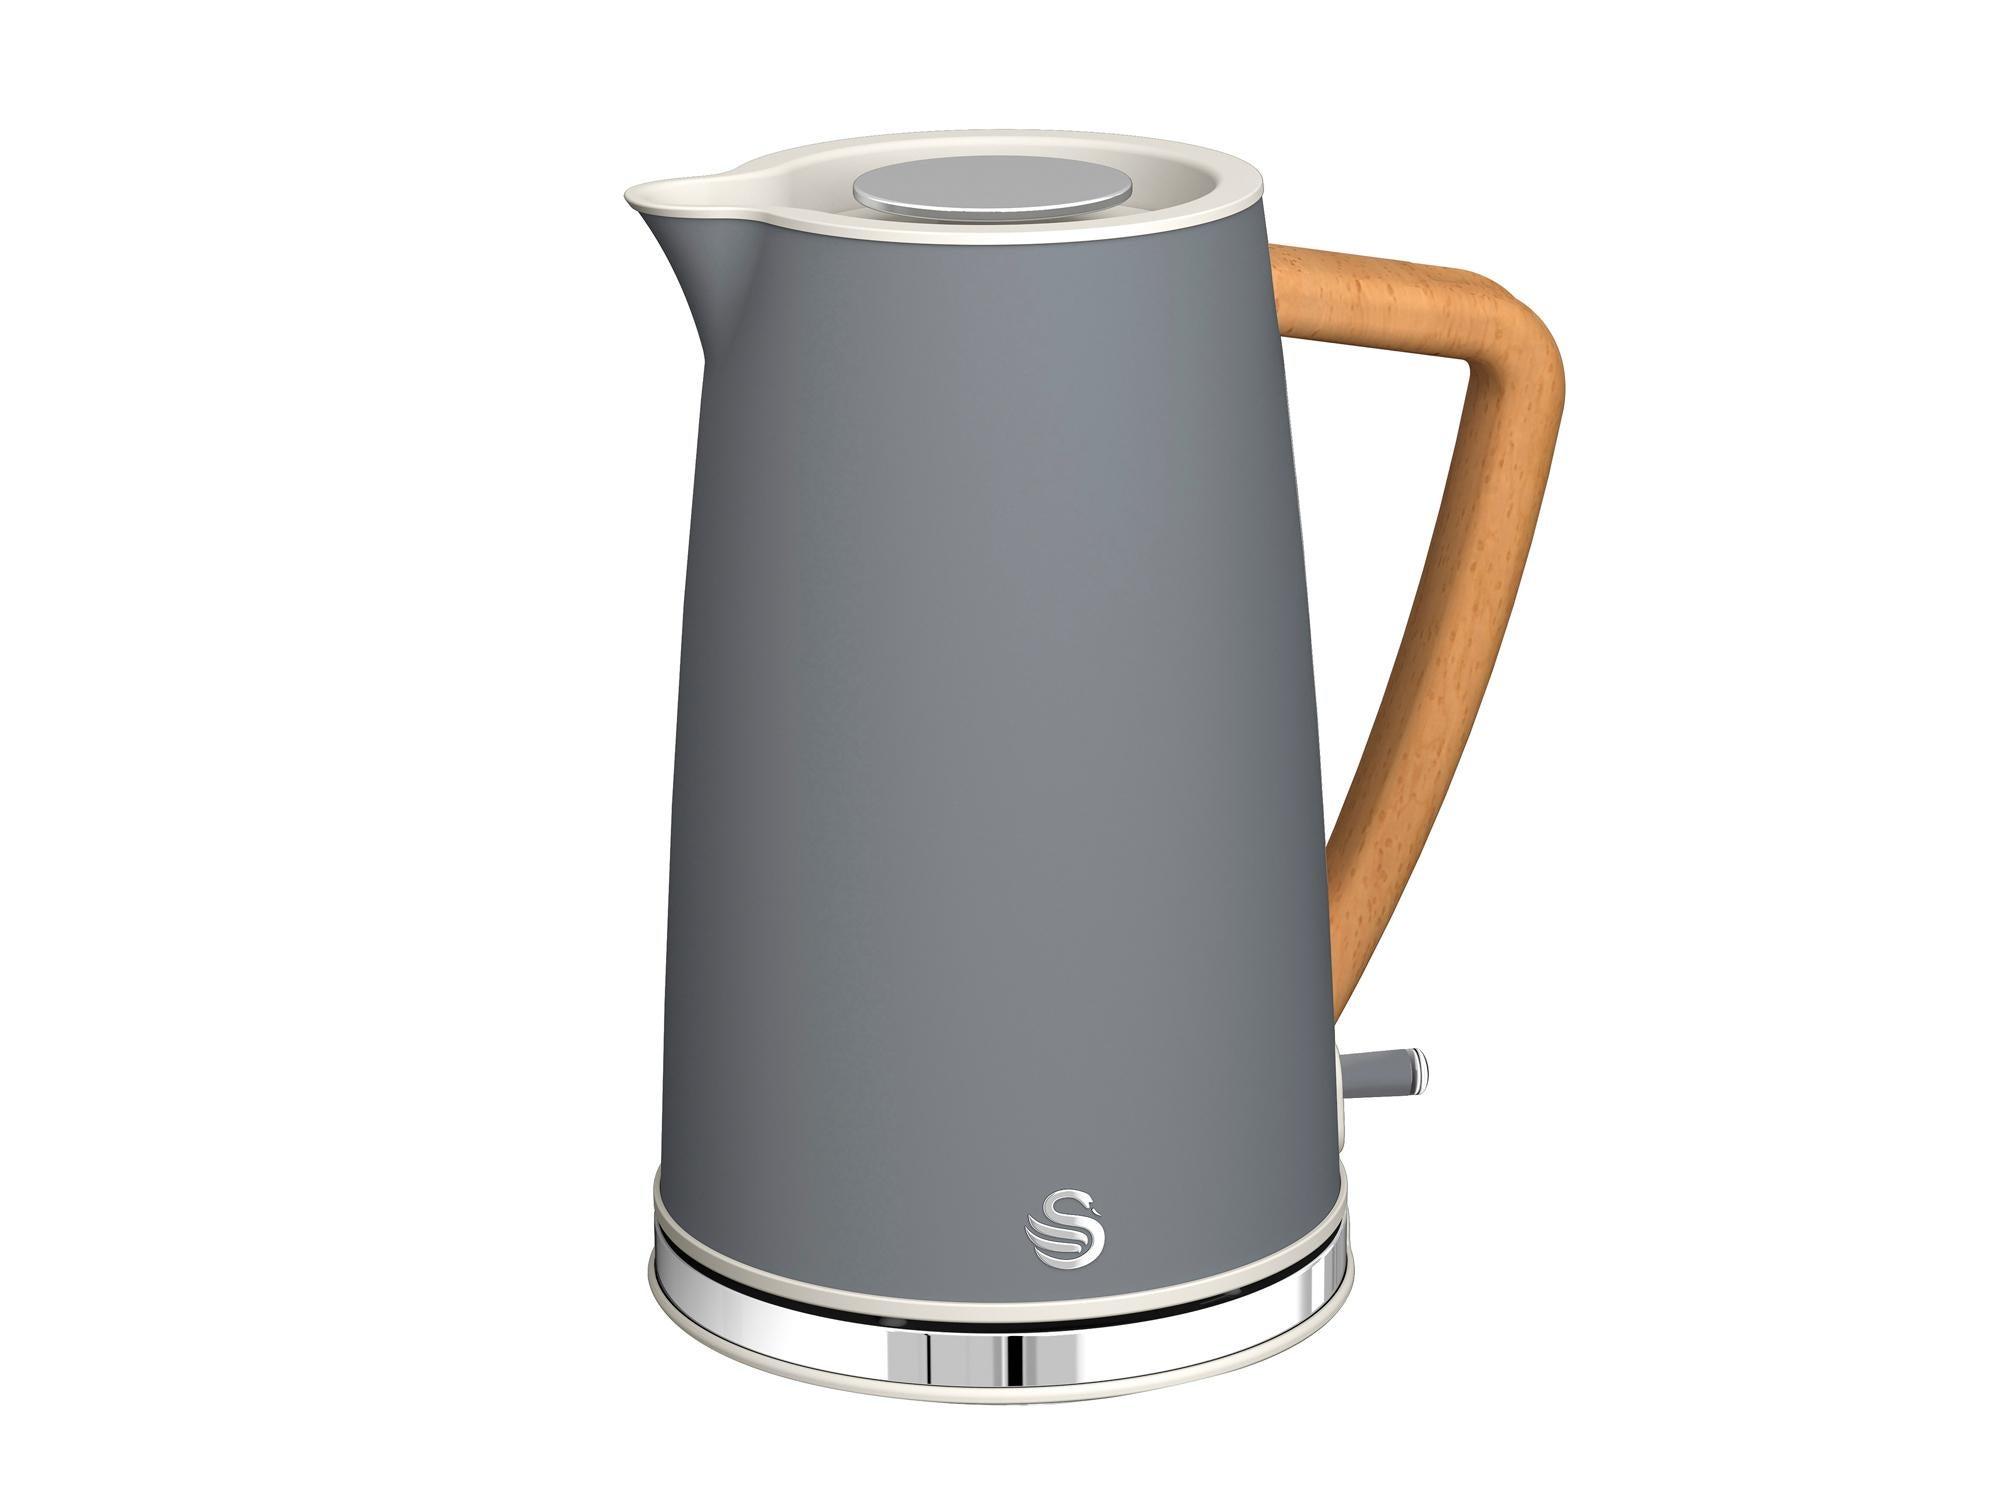 Swan 2200W 1.7 Litre Black Electric Cordless Jug Kettle Fast Rapid Water Boil